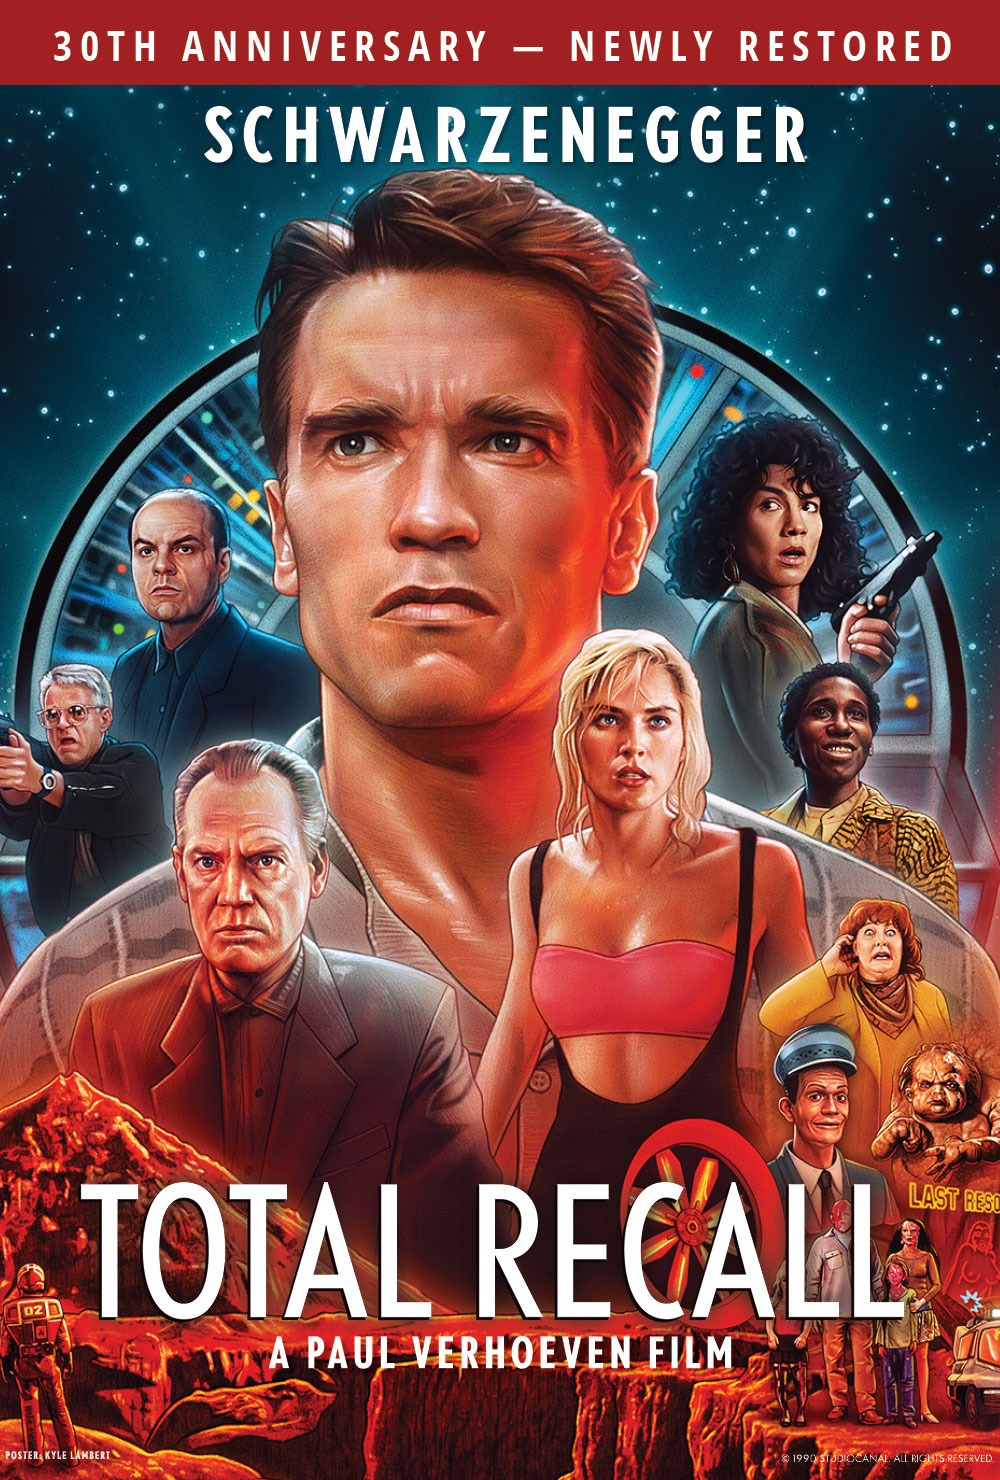 Total Recall (30th Anniversary Restoration)